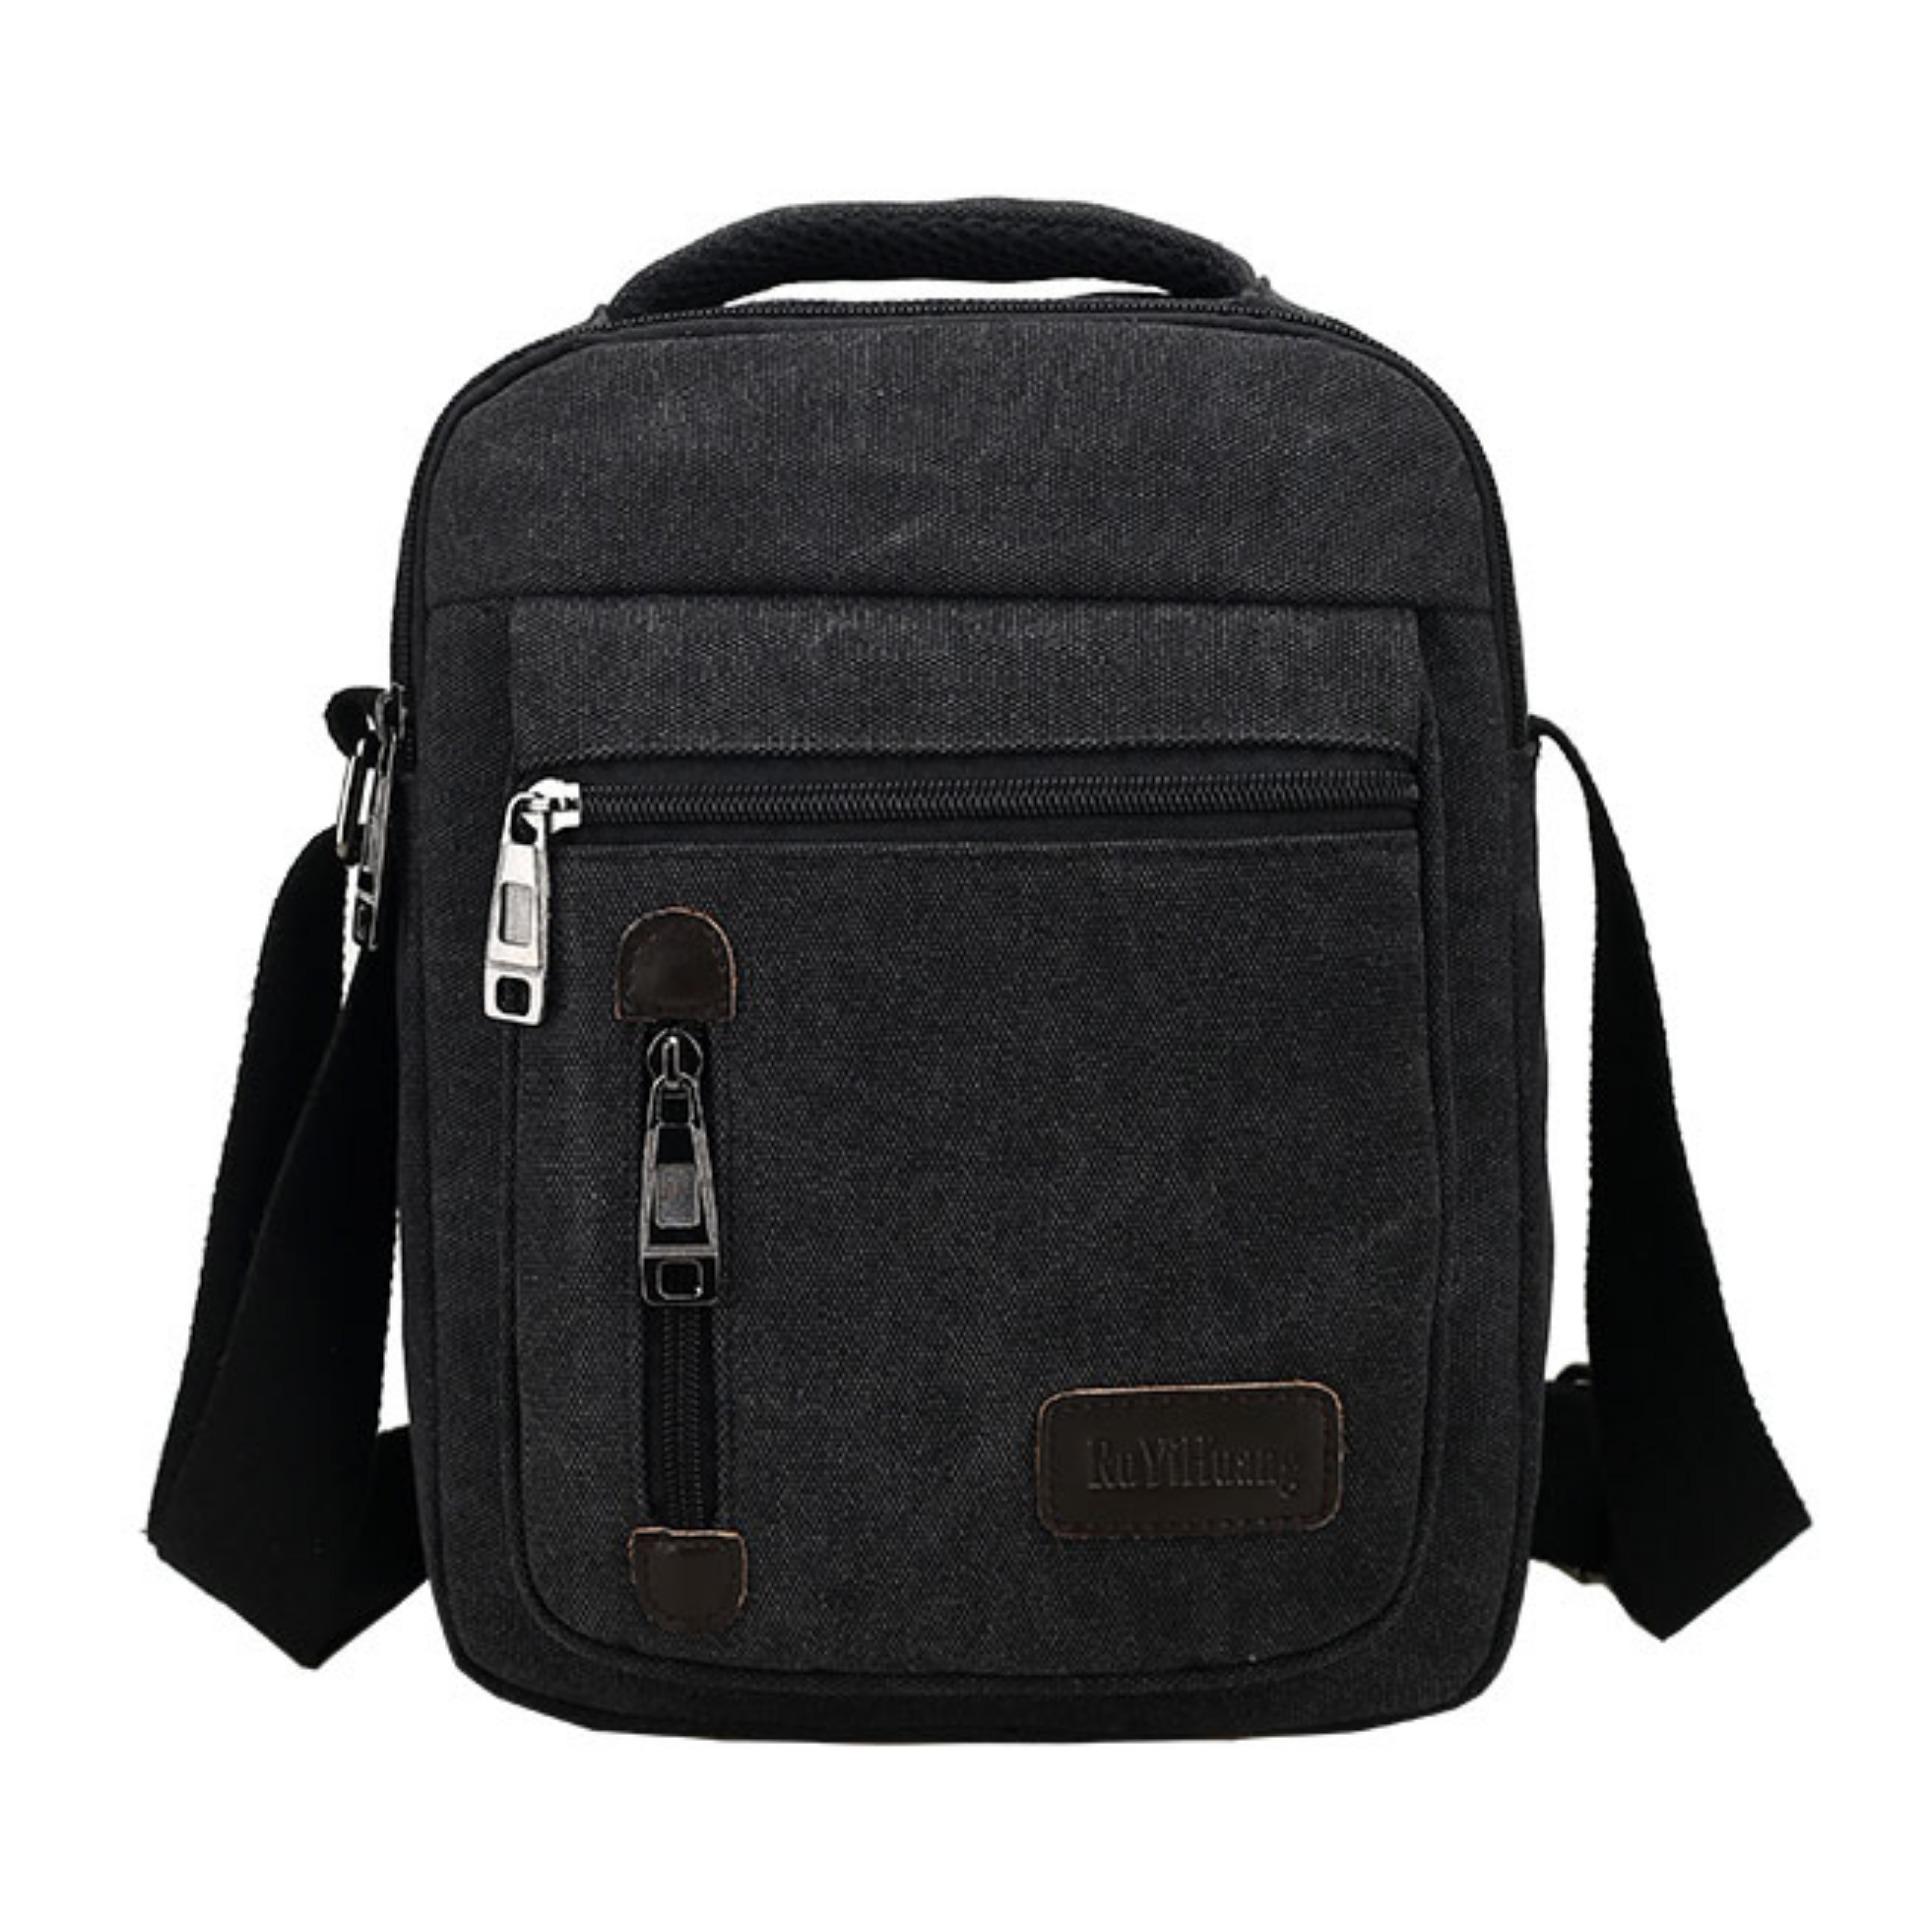 Color Khakis or Black Tas Pria Import Batam Model Terbaru D7007 Men Messenger Shoulder Outdoor Travel Bag Black